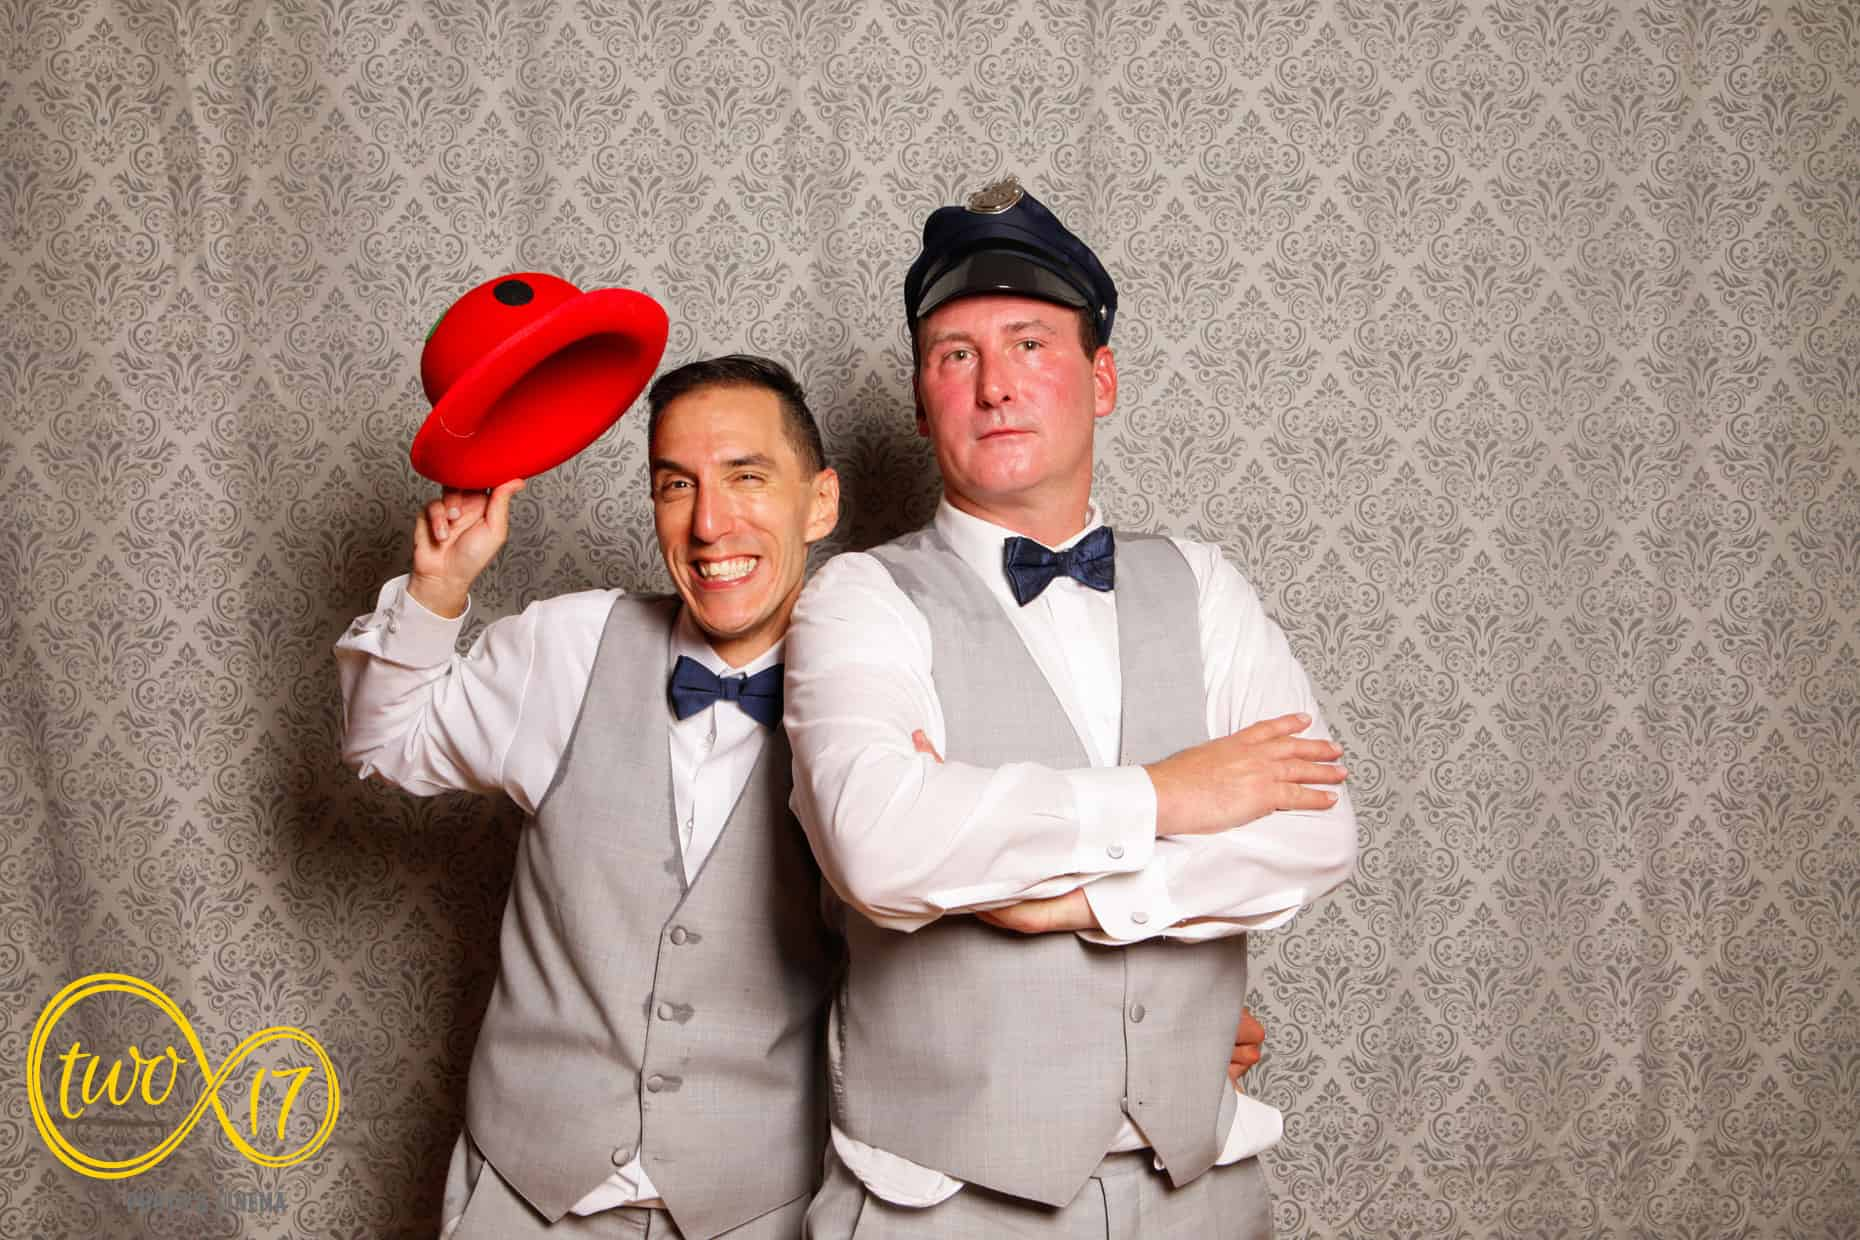 gay wedding photo booths